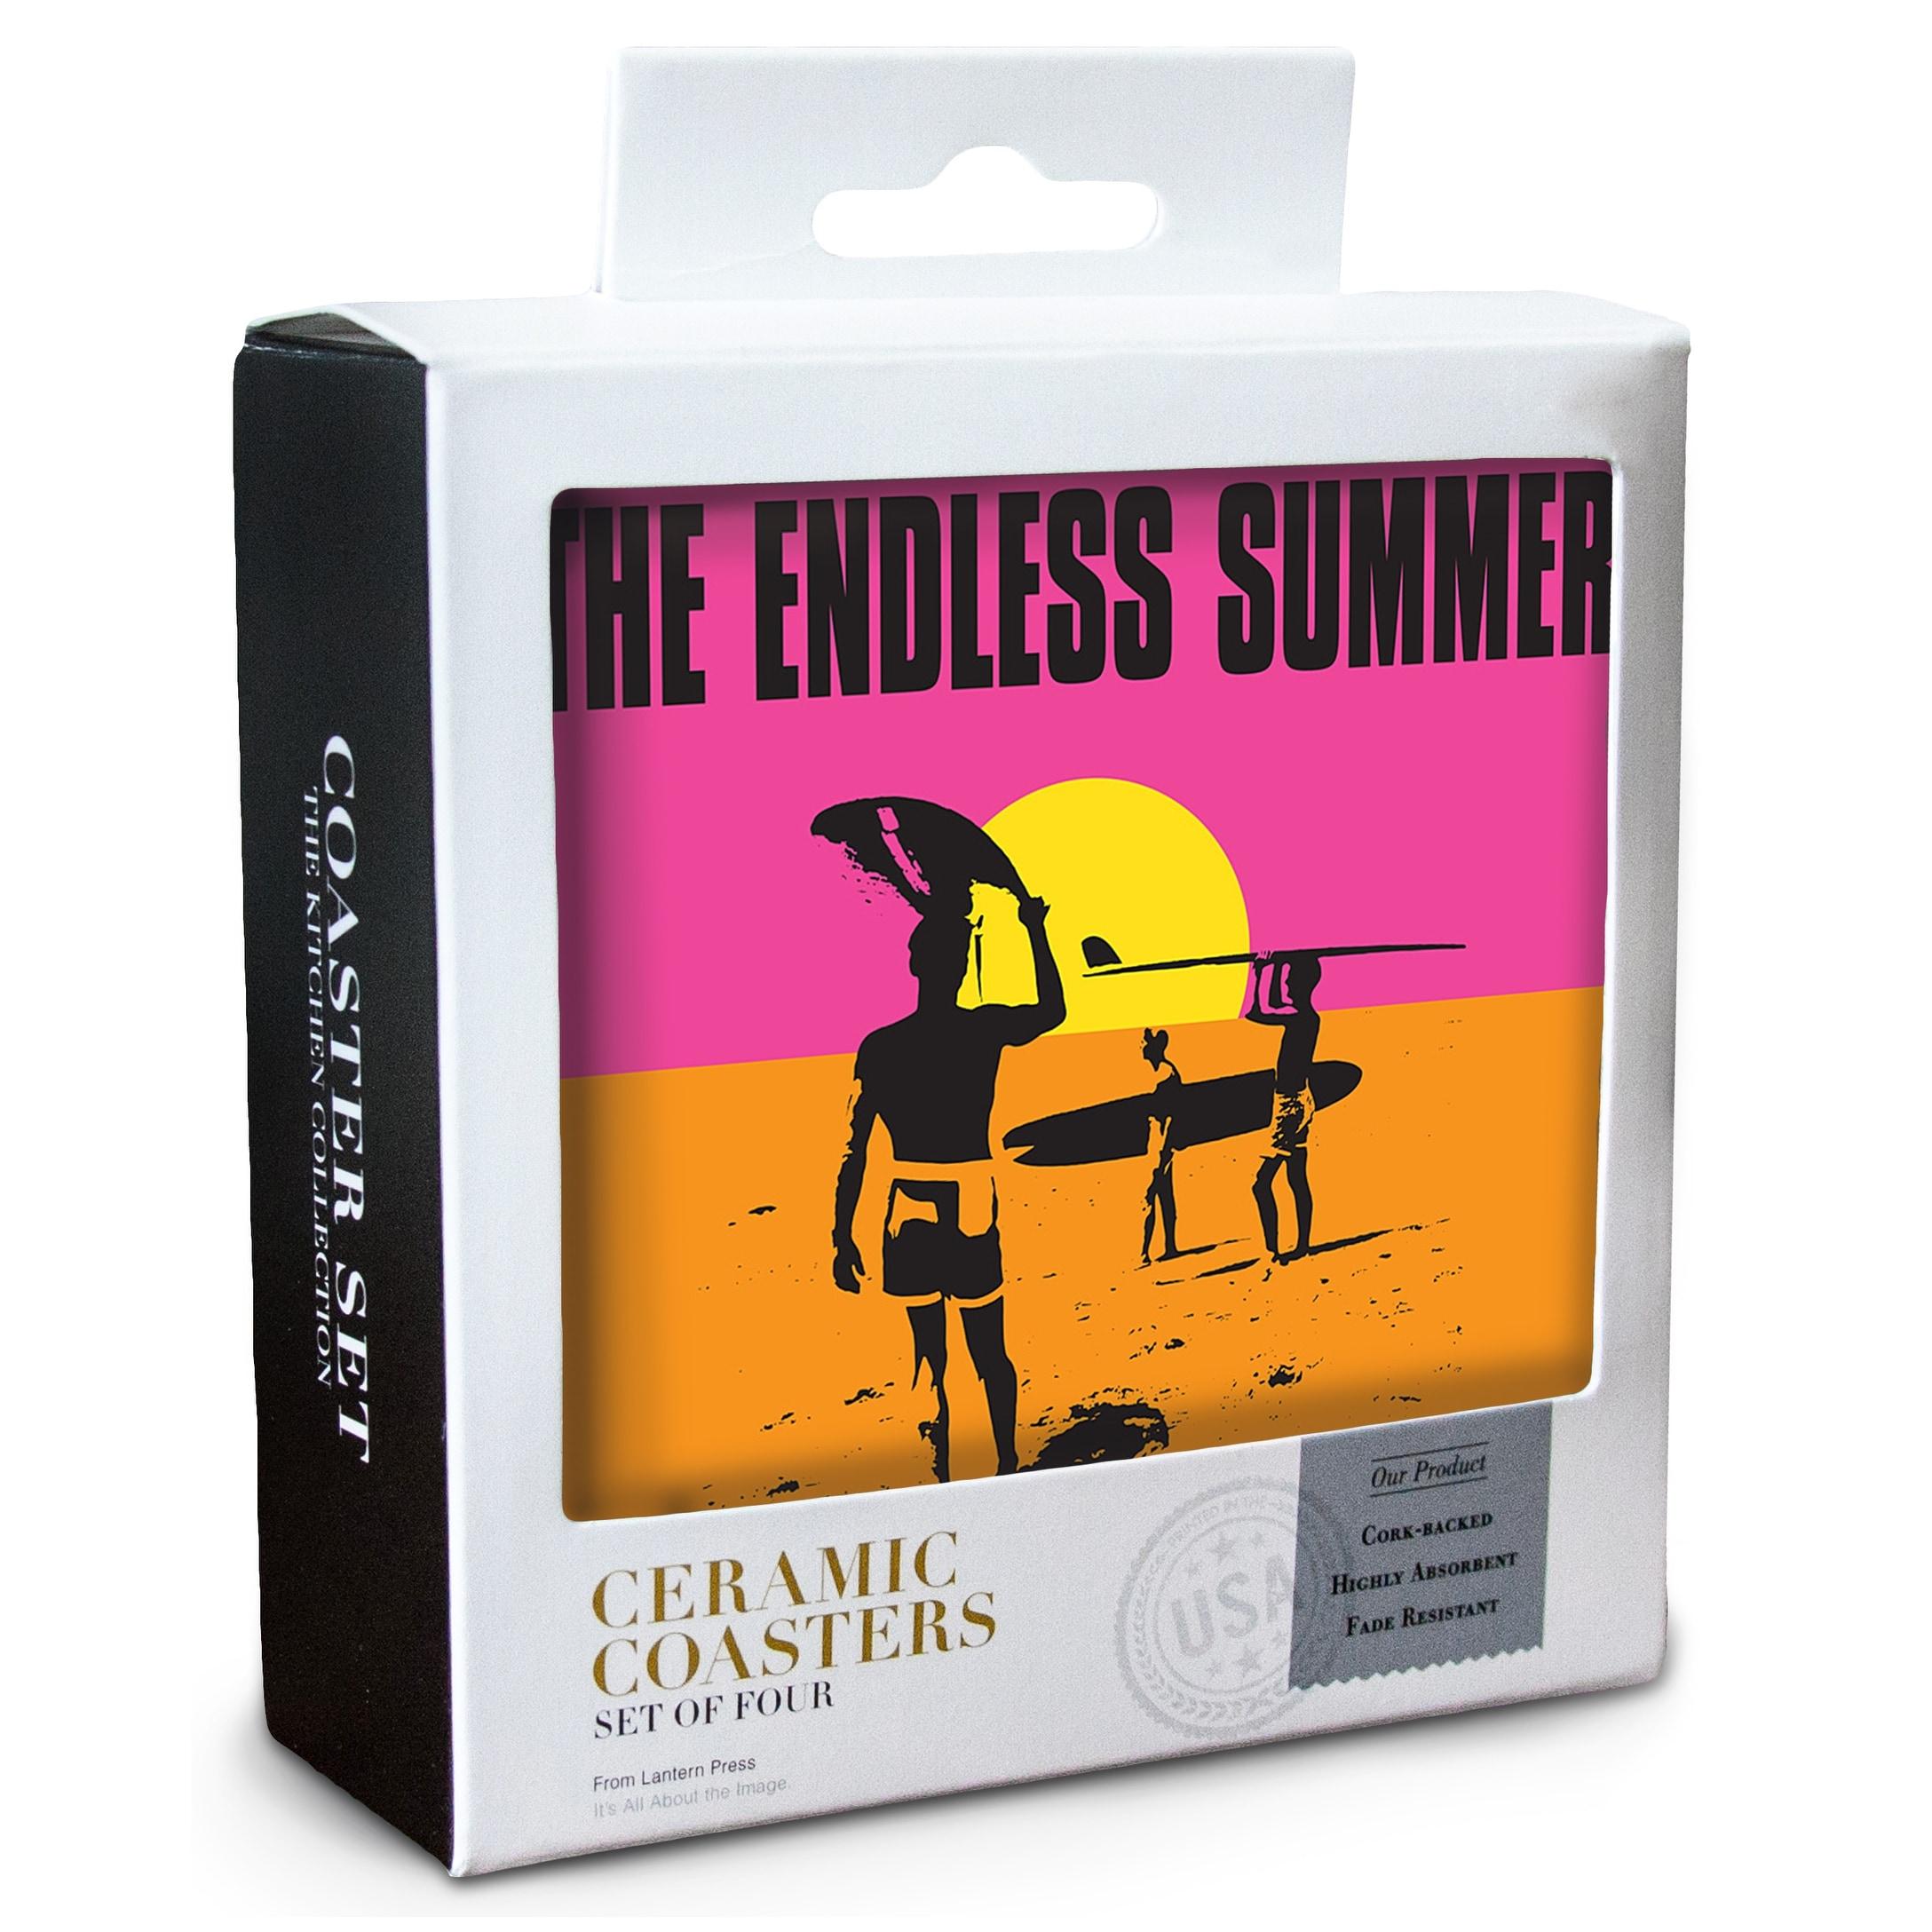 Siesta Key FL Endless Summer Original Movie Poster Set Of 4 Ceramic Coasters